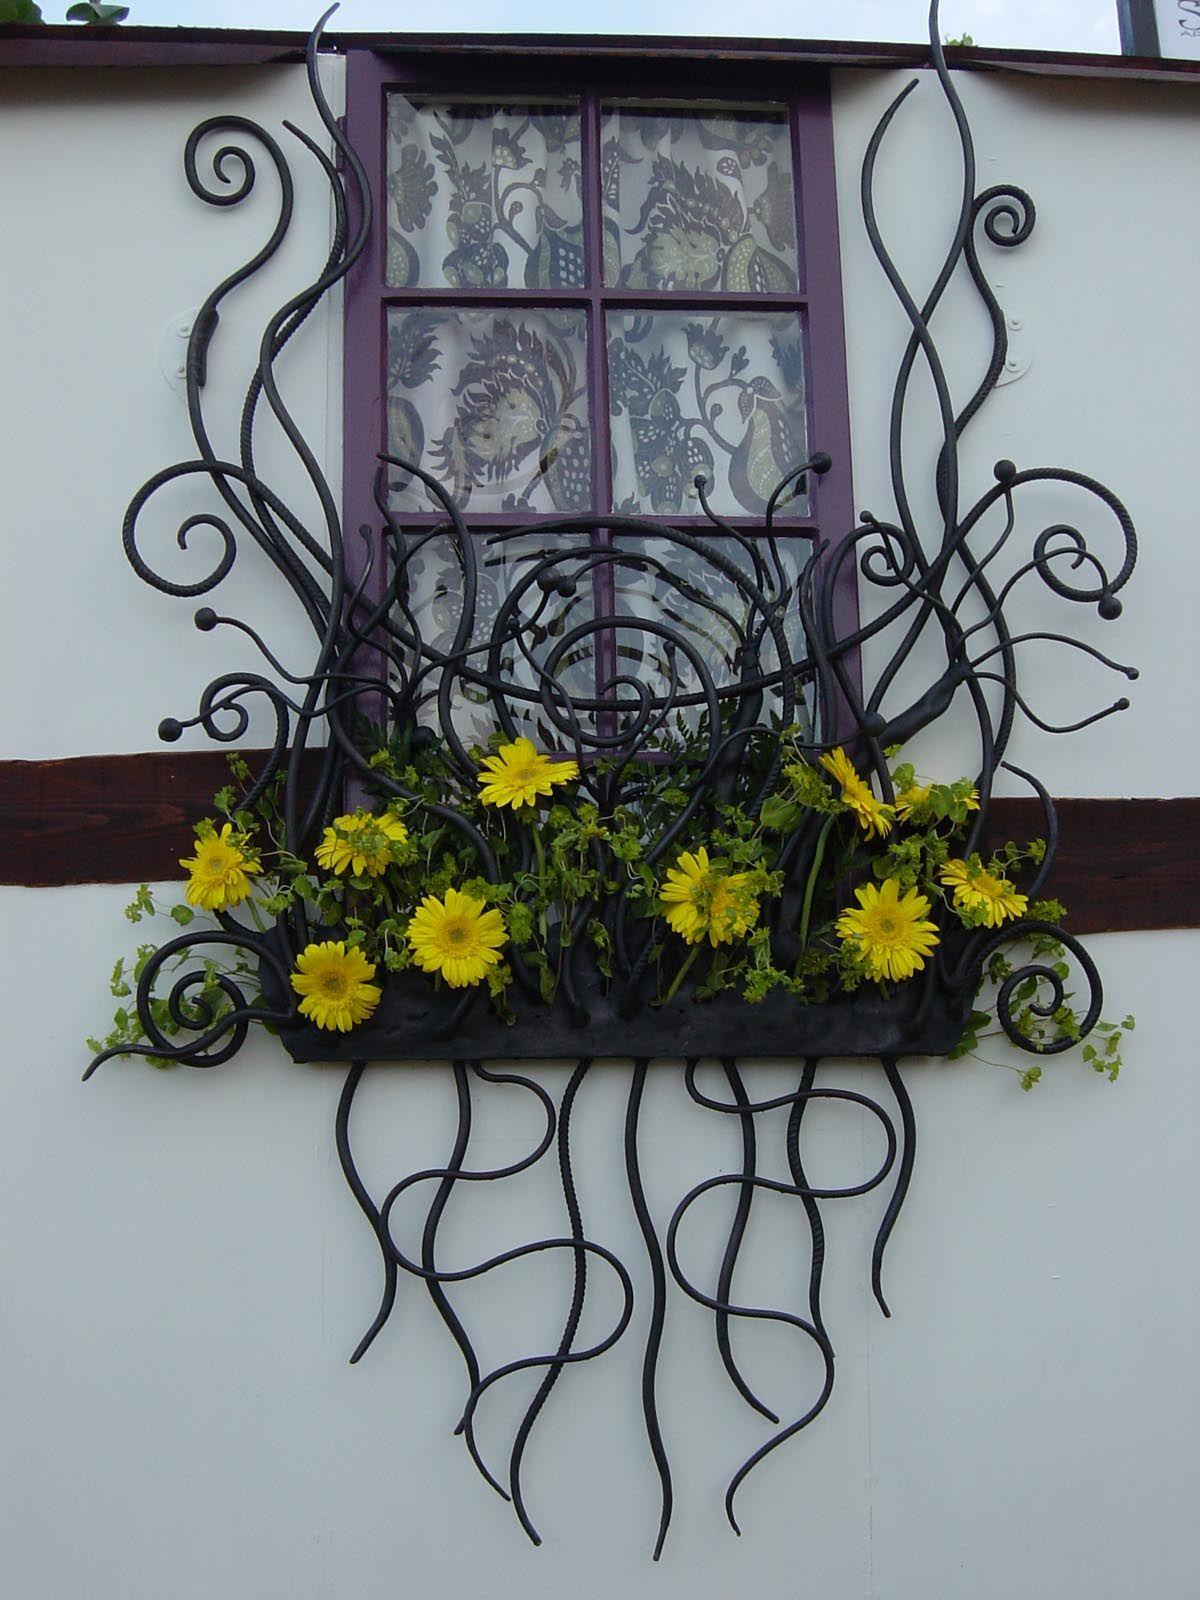 Cool Windowbox - Bex Simon Blacksmith Artist Window